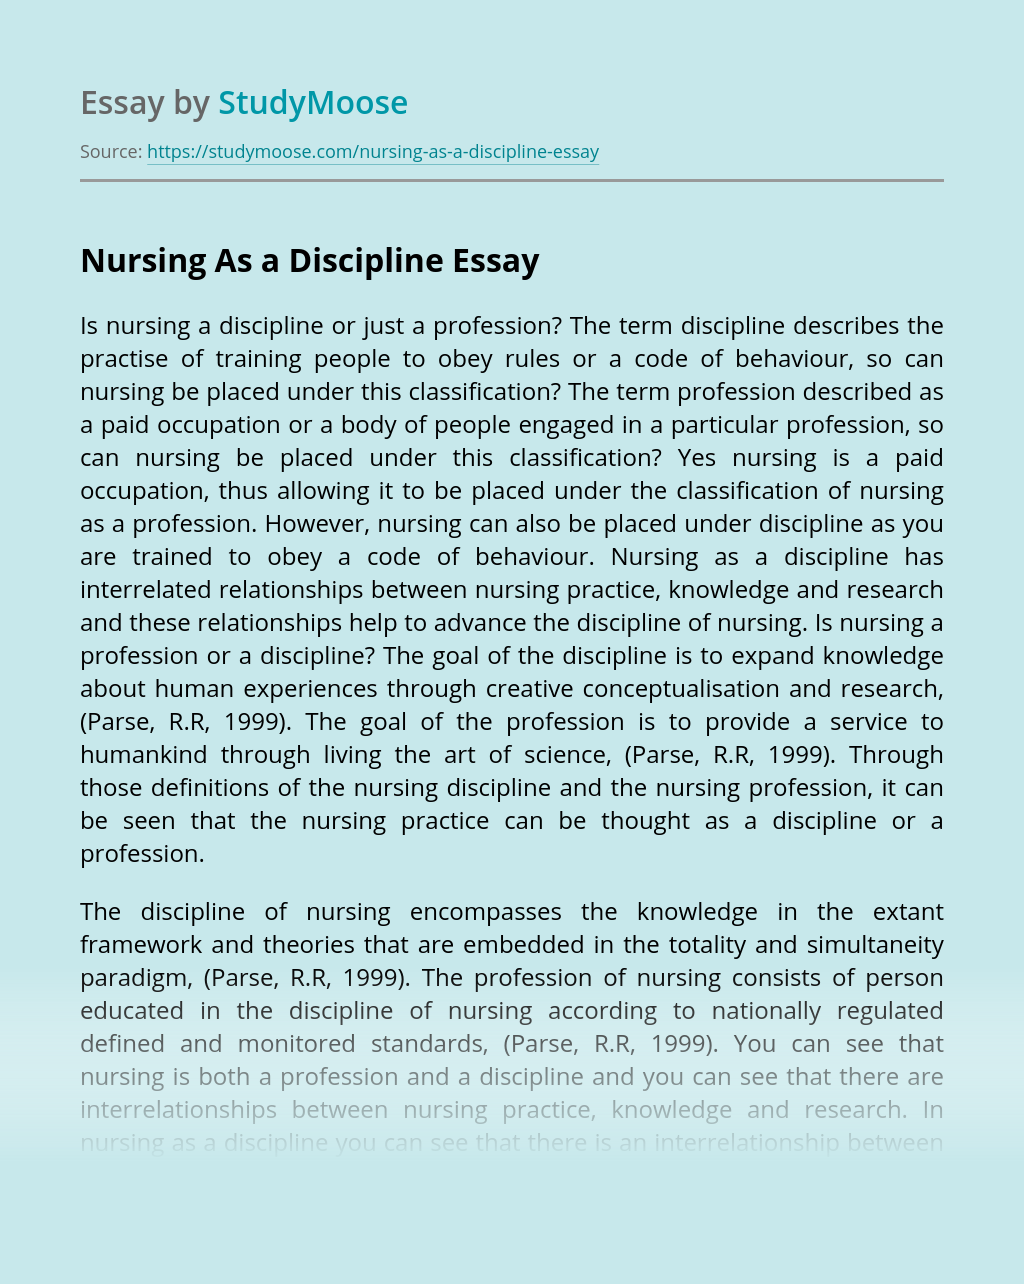 Nursing As a Discipline